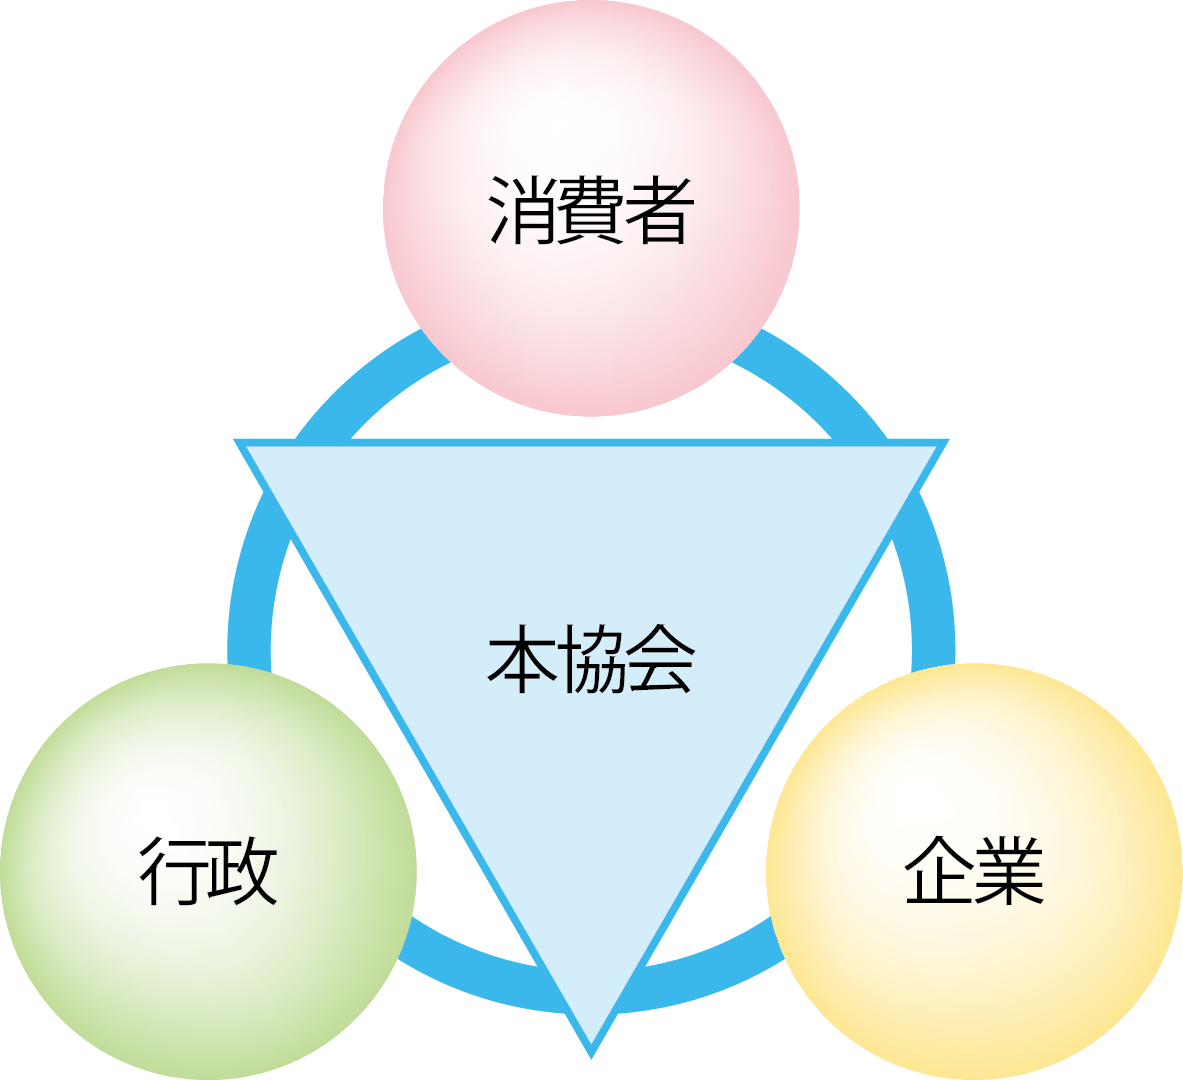 日本化粧品協会と消費者・行政・企業との関係図